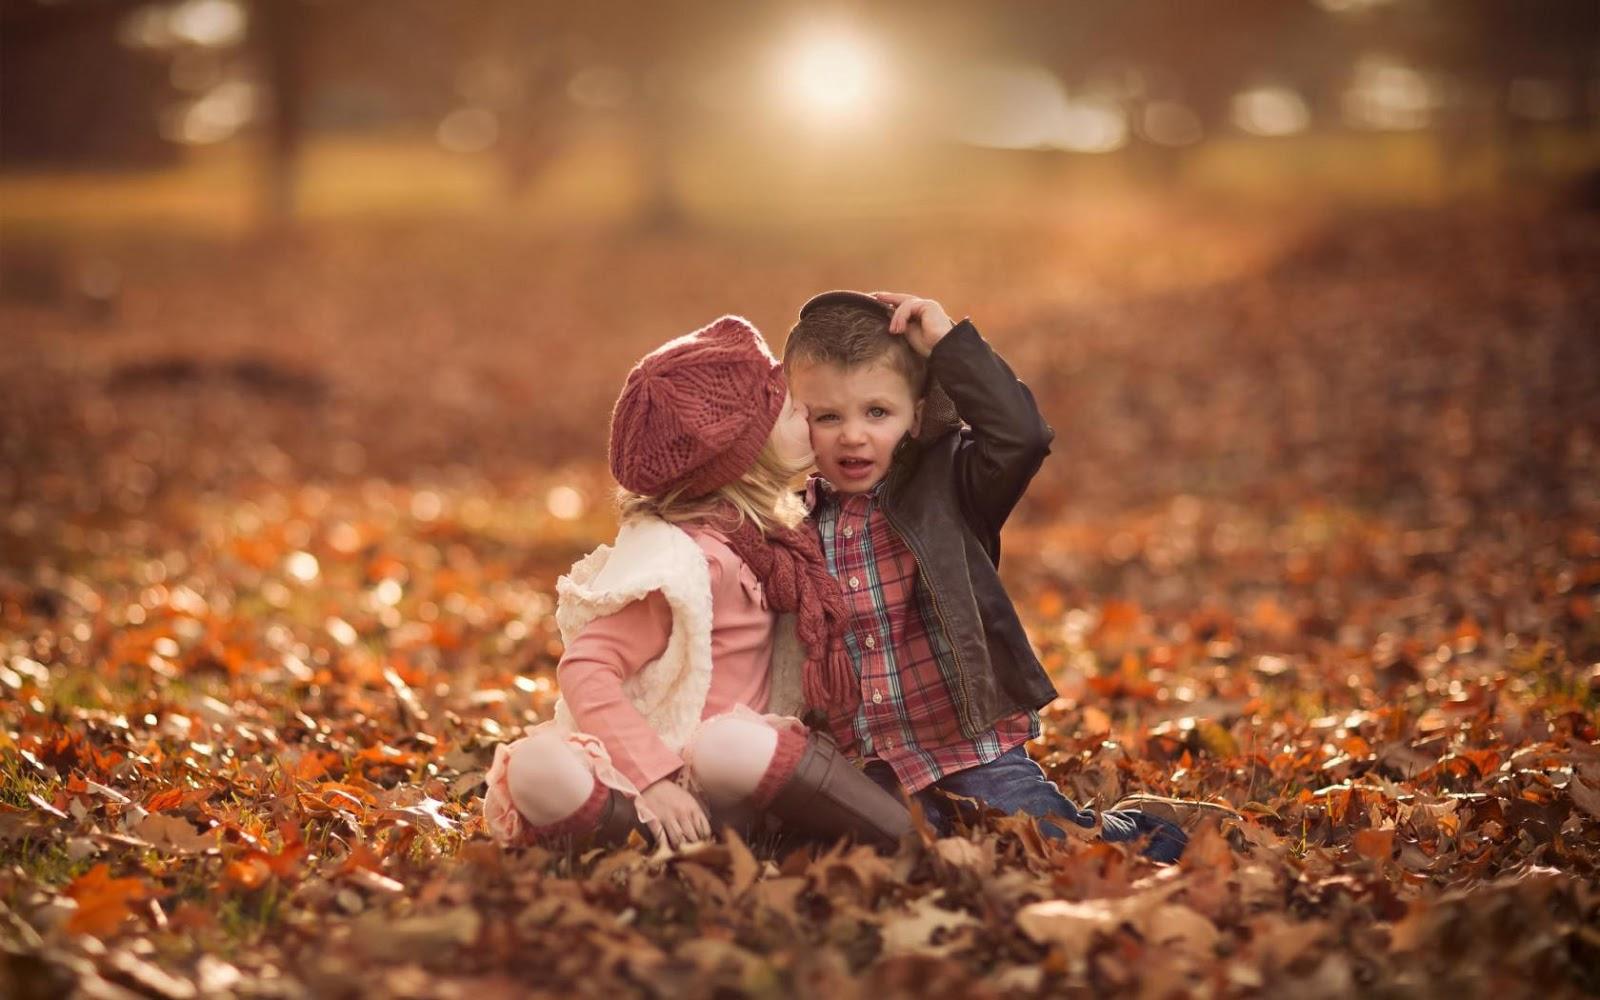 Love Couple Kiss Images 50 Romantic Hd Wallpapers Pics Whatsapp